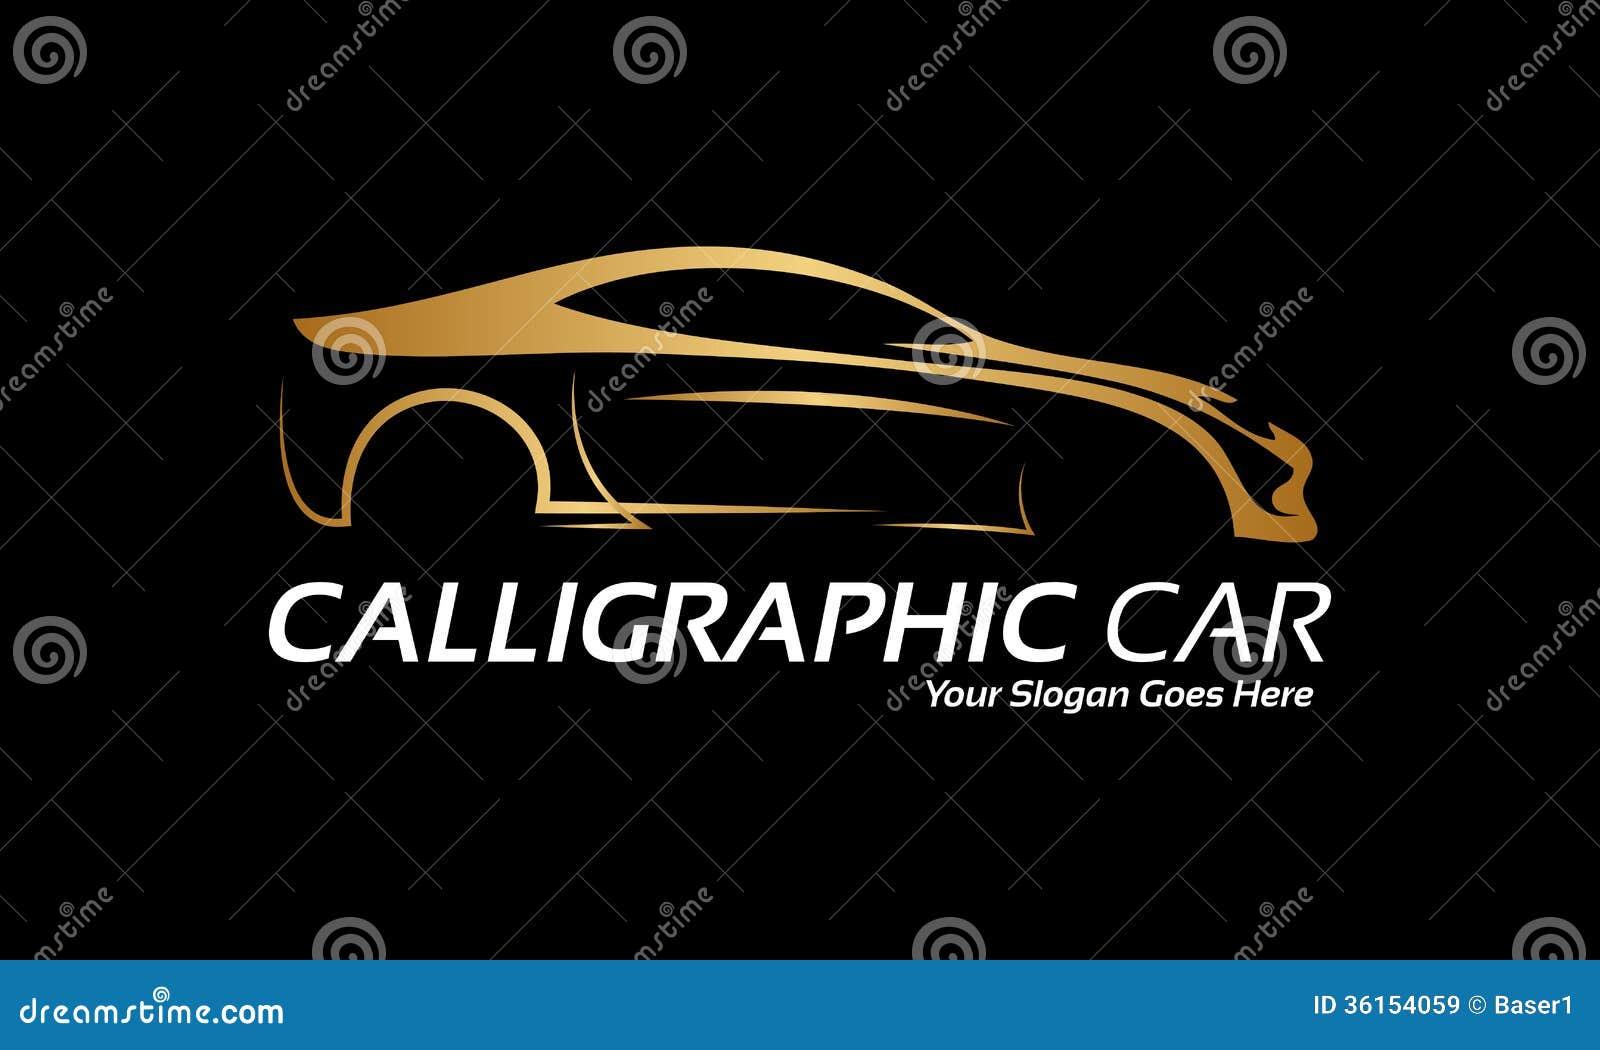 Logo Design Ideas Database